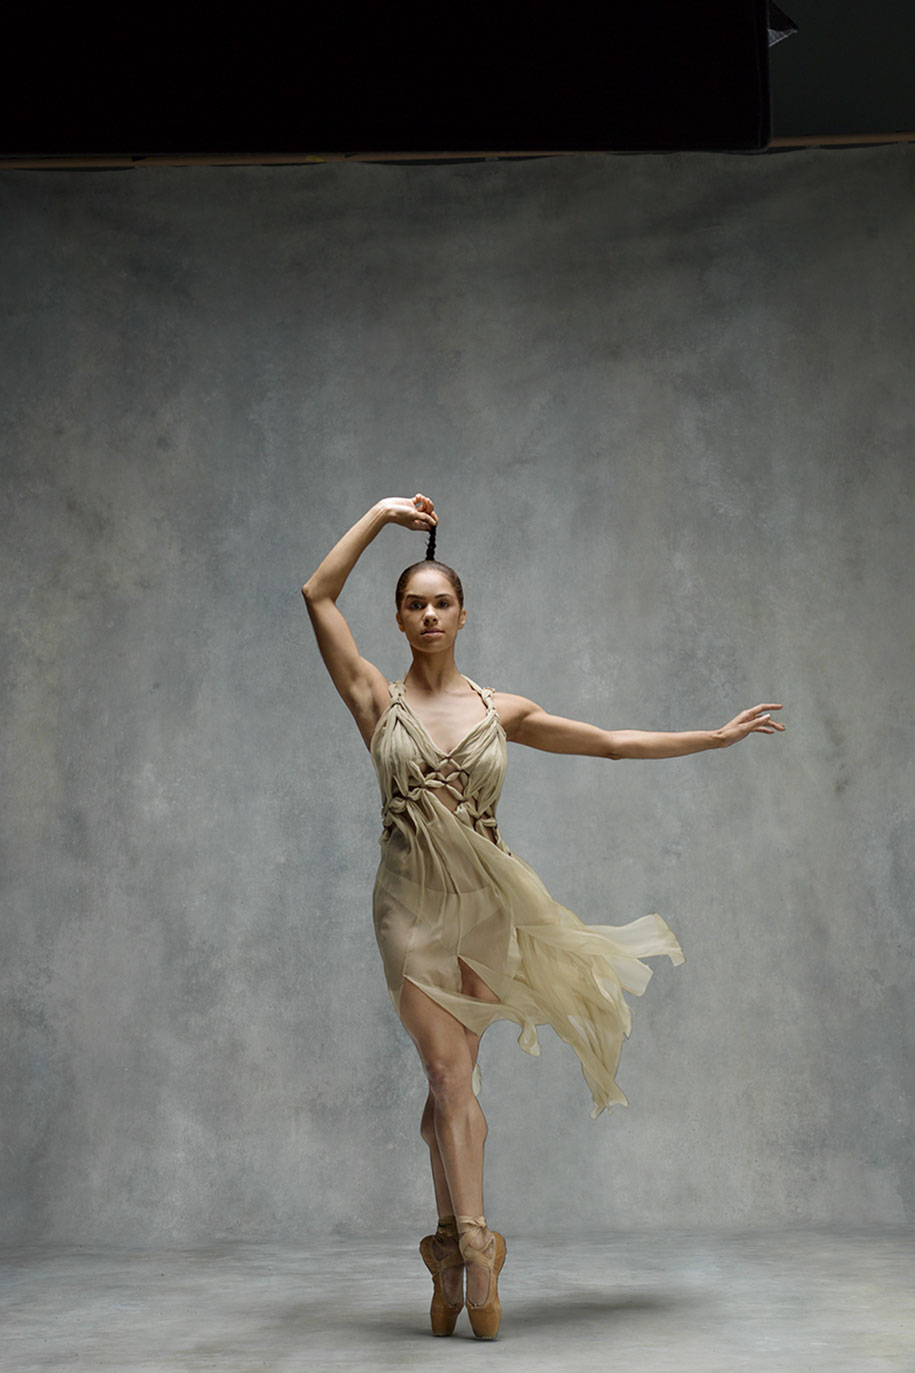 dipinti-danza-edgar-degas-fotografia-misty-copeland-4